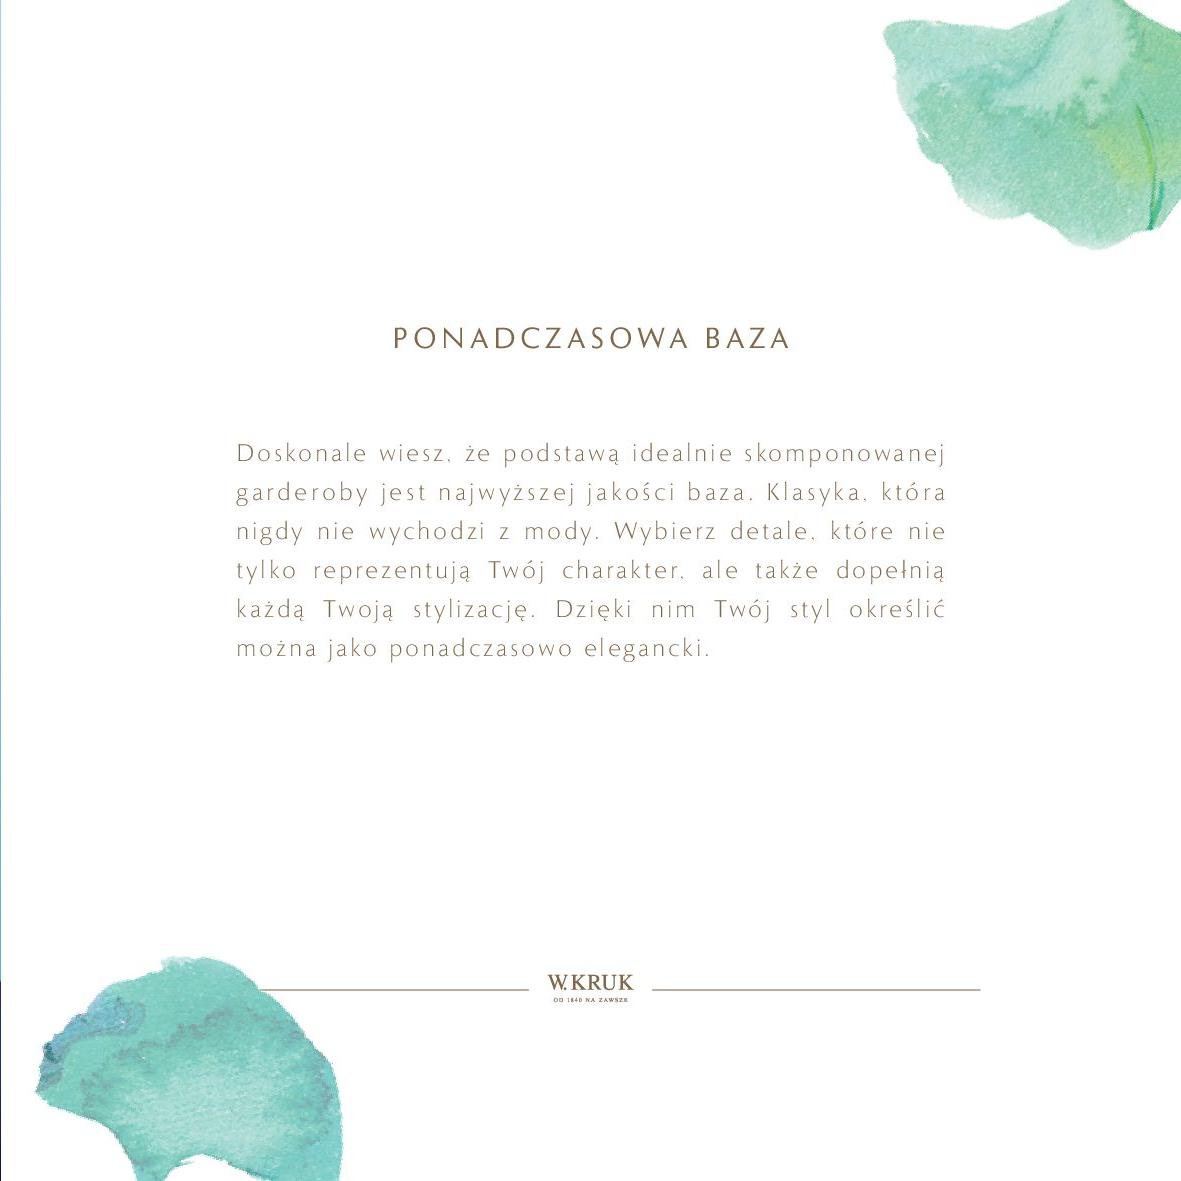 Gazetka W. KRUK: Katalog - Akcesoria 2021-02-17 page-61